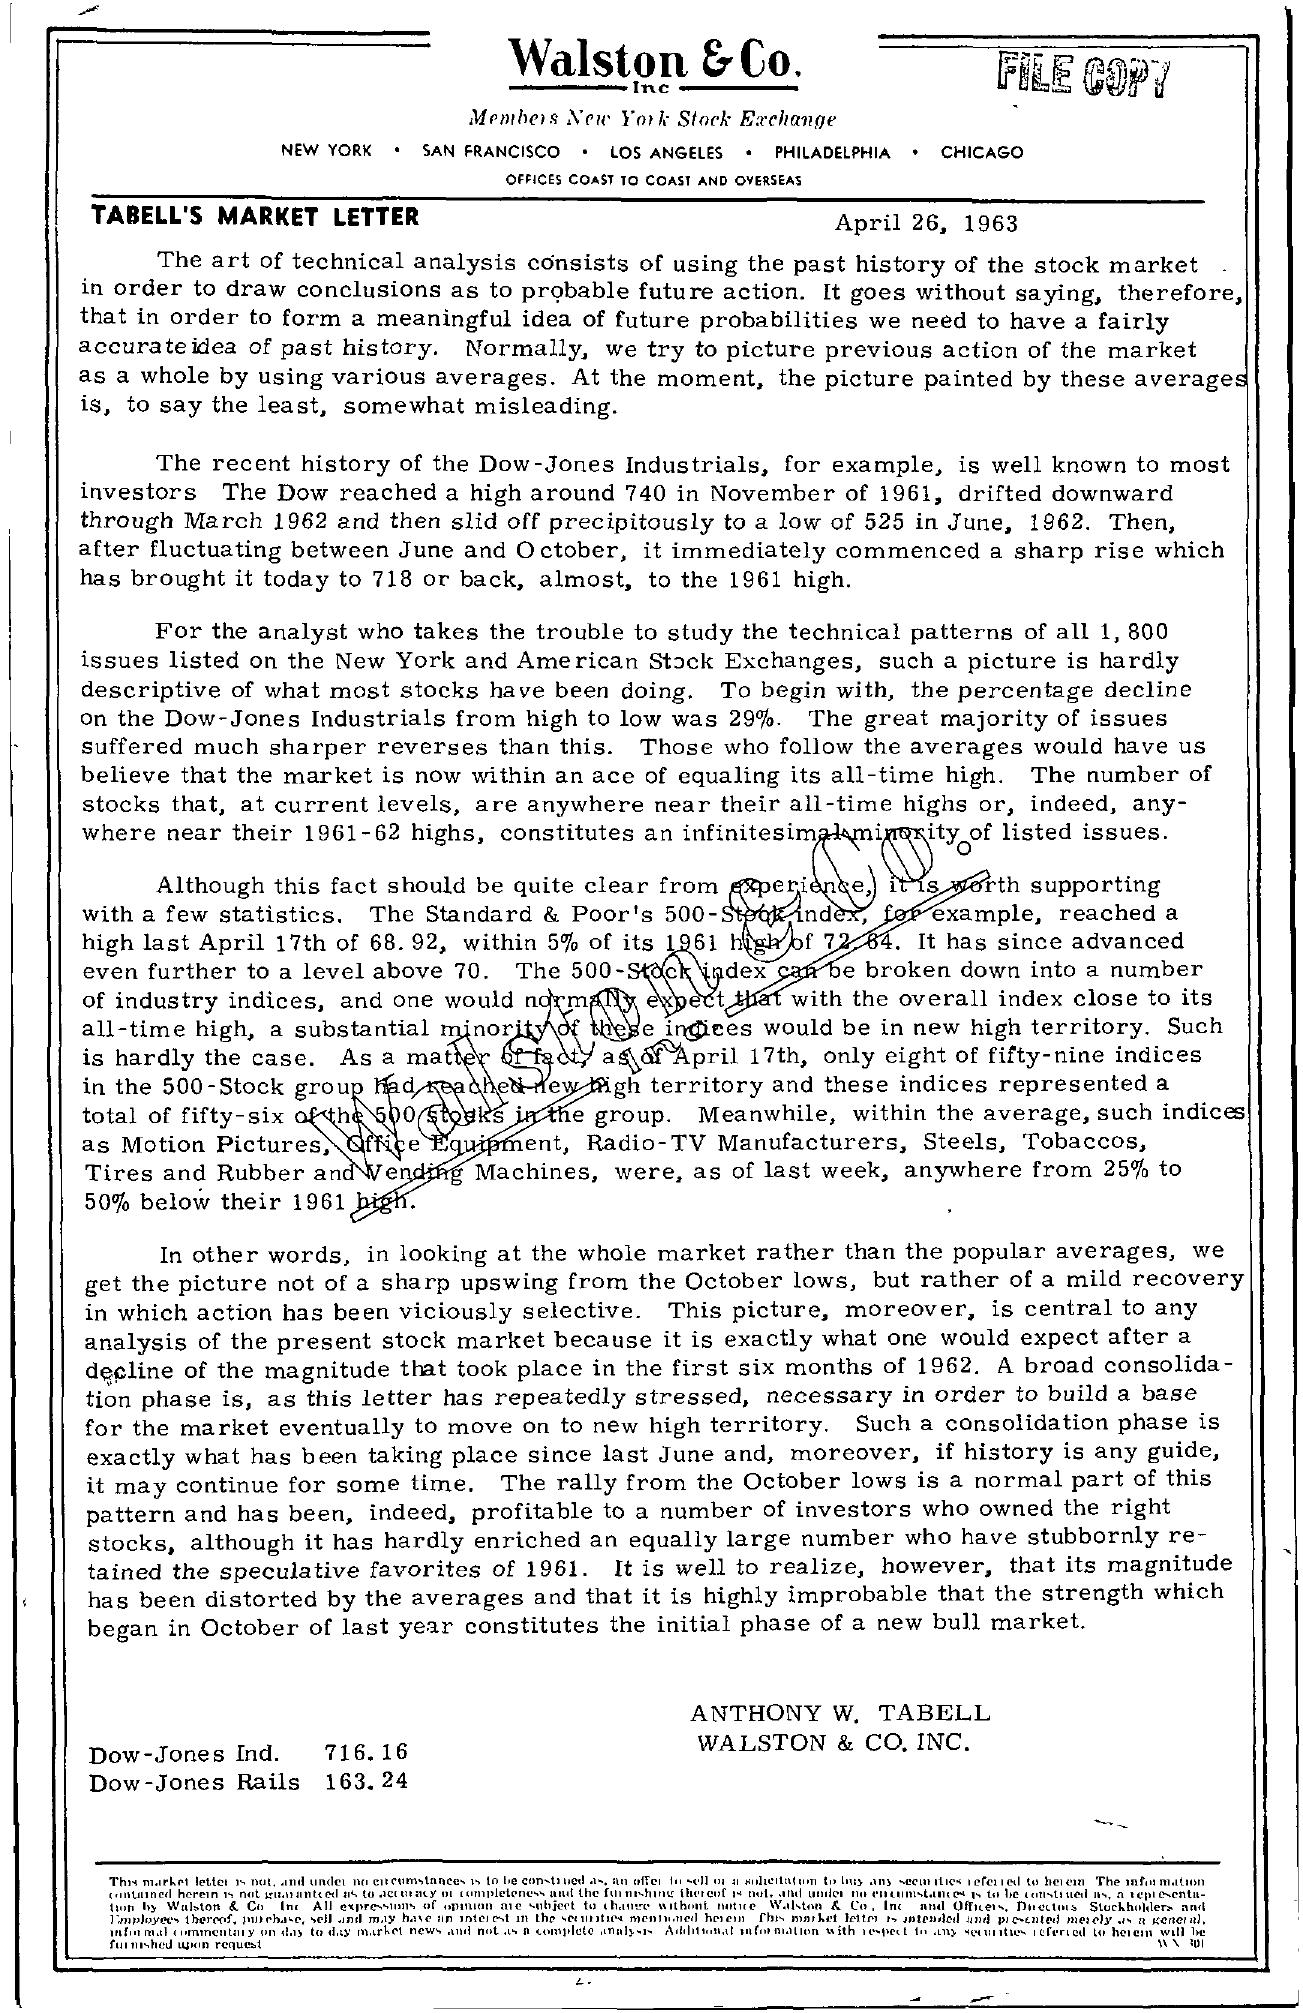 Tabell's Market Letter - April 26, 1963